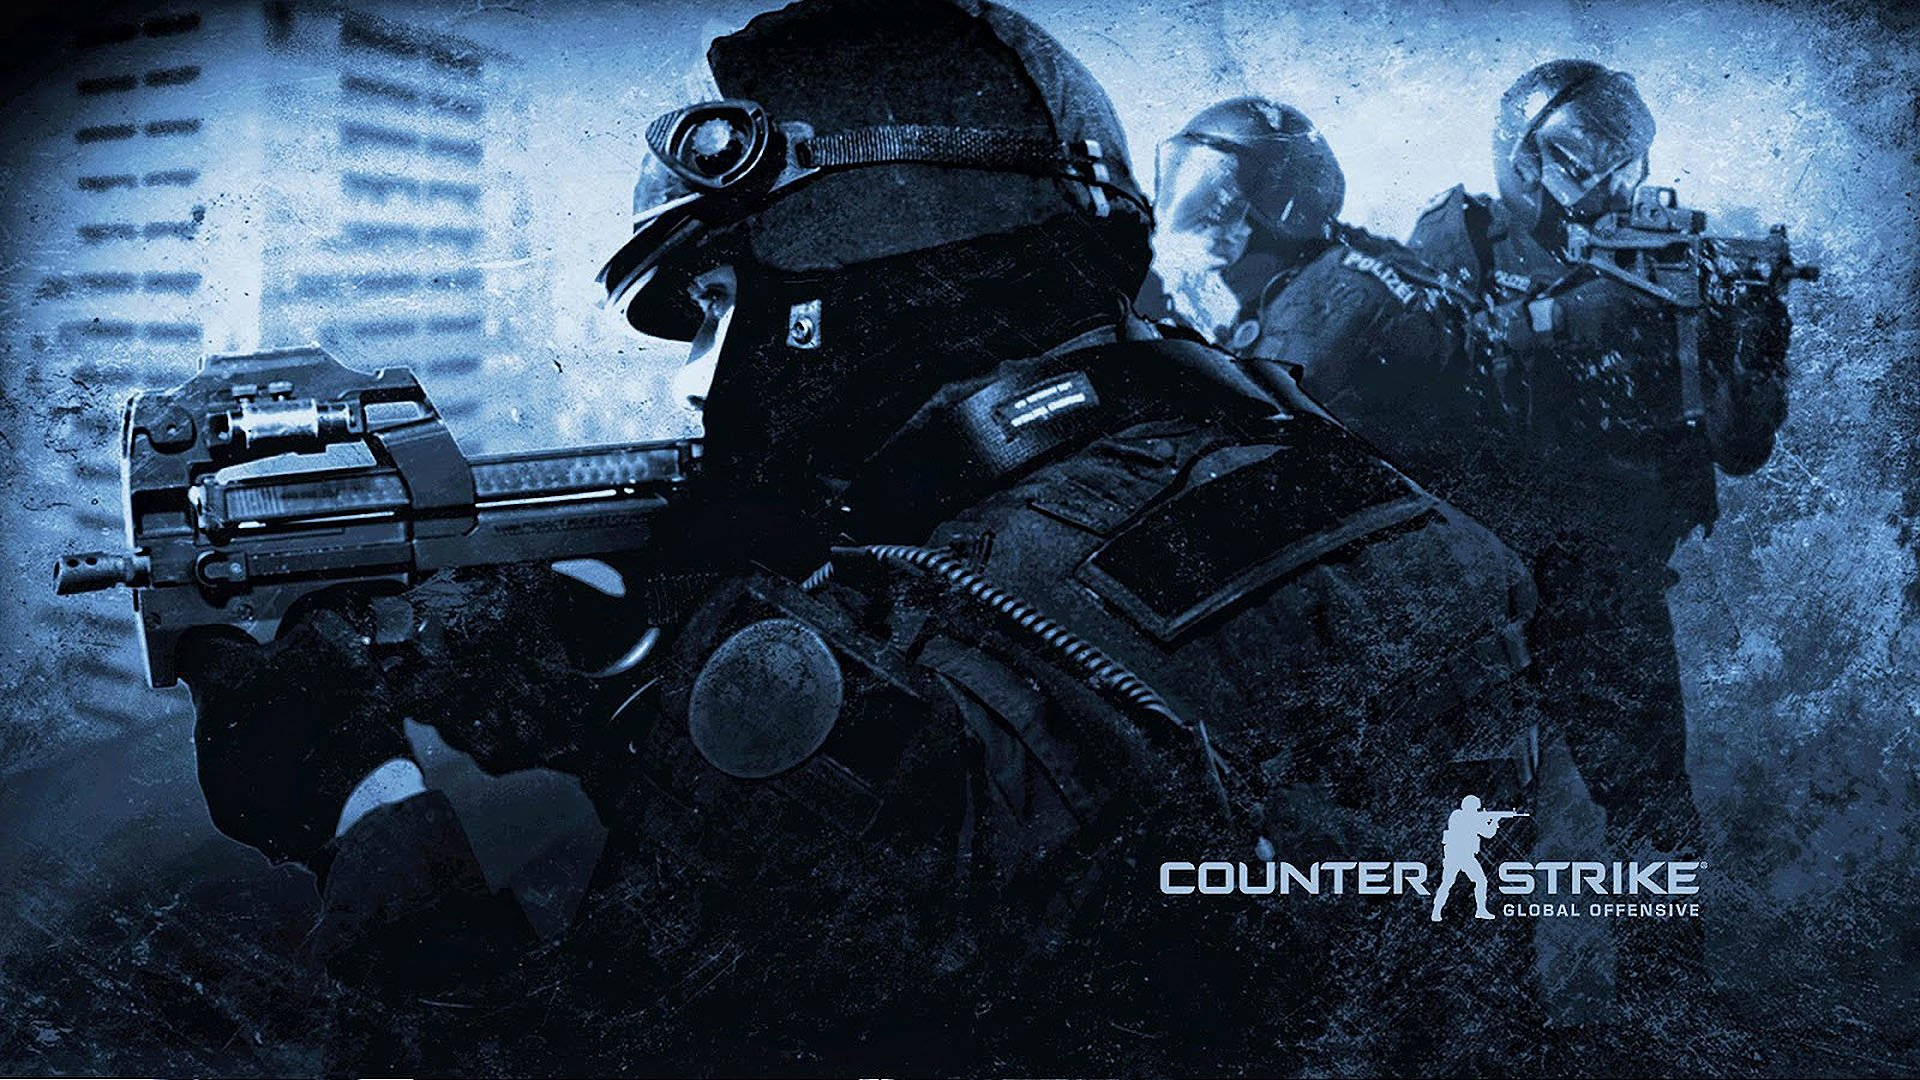 Постер Counter-Strike: Global Offensive